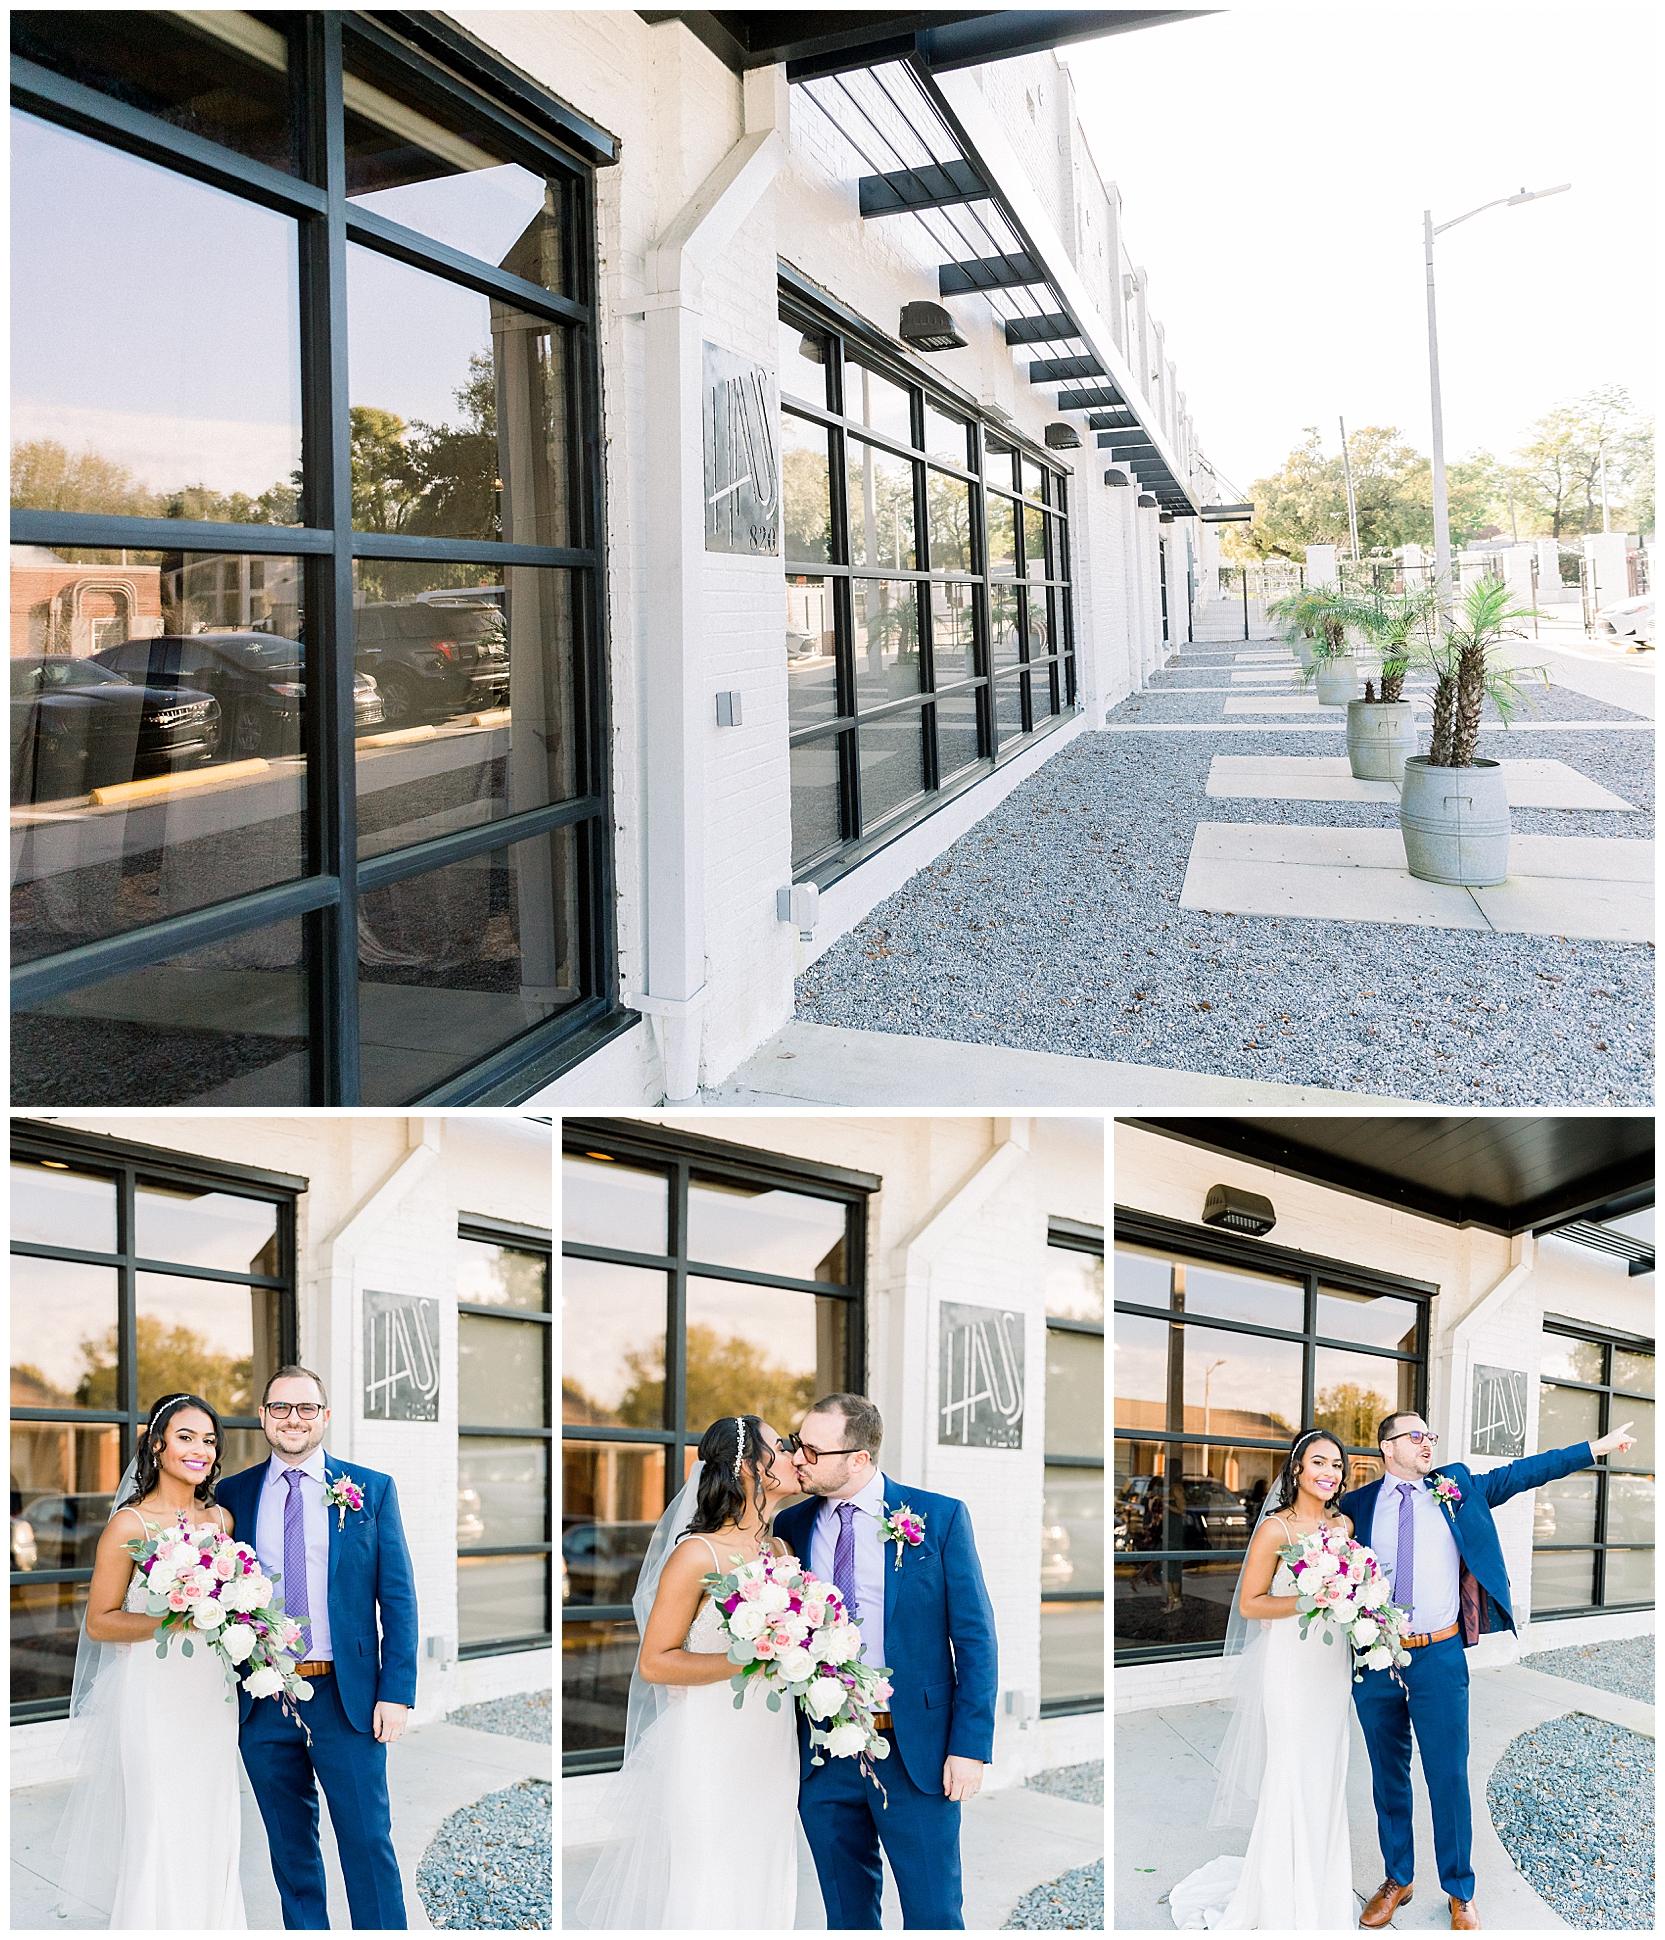 jessicafredericks_lakeland_tampa_wedding_purple_crazy hour_0052.jpg